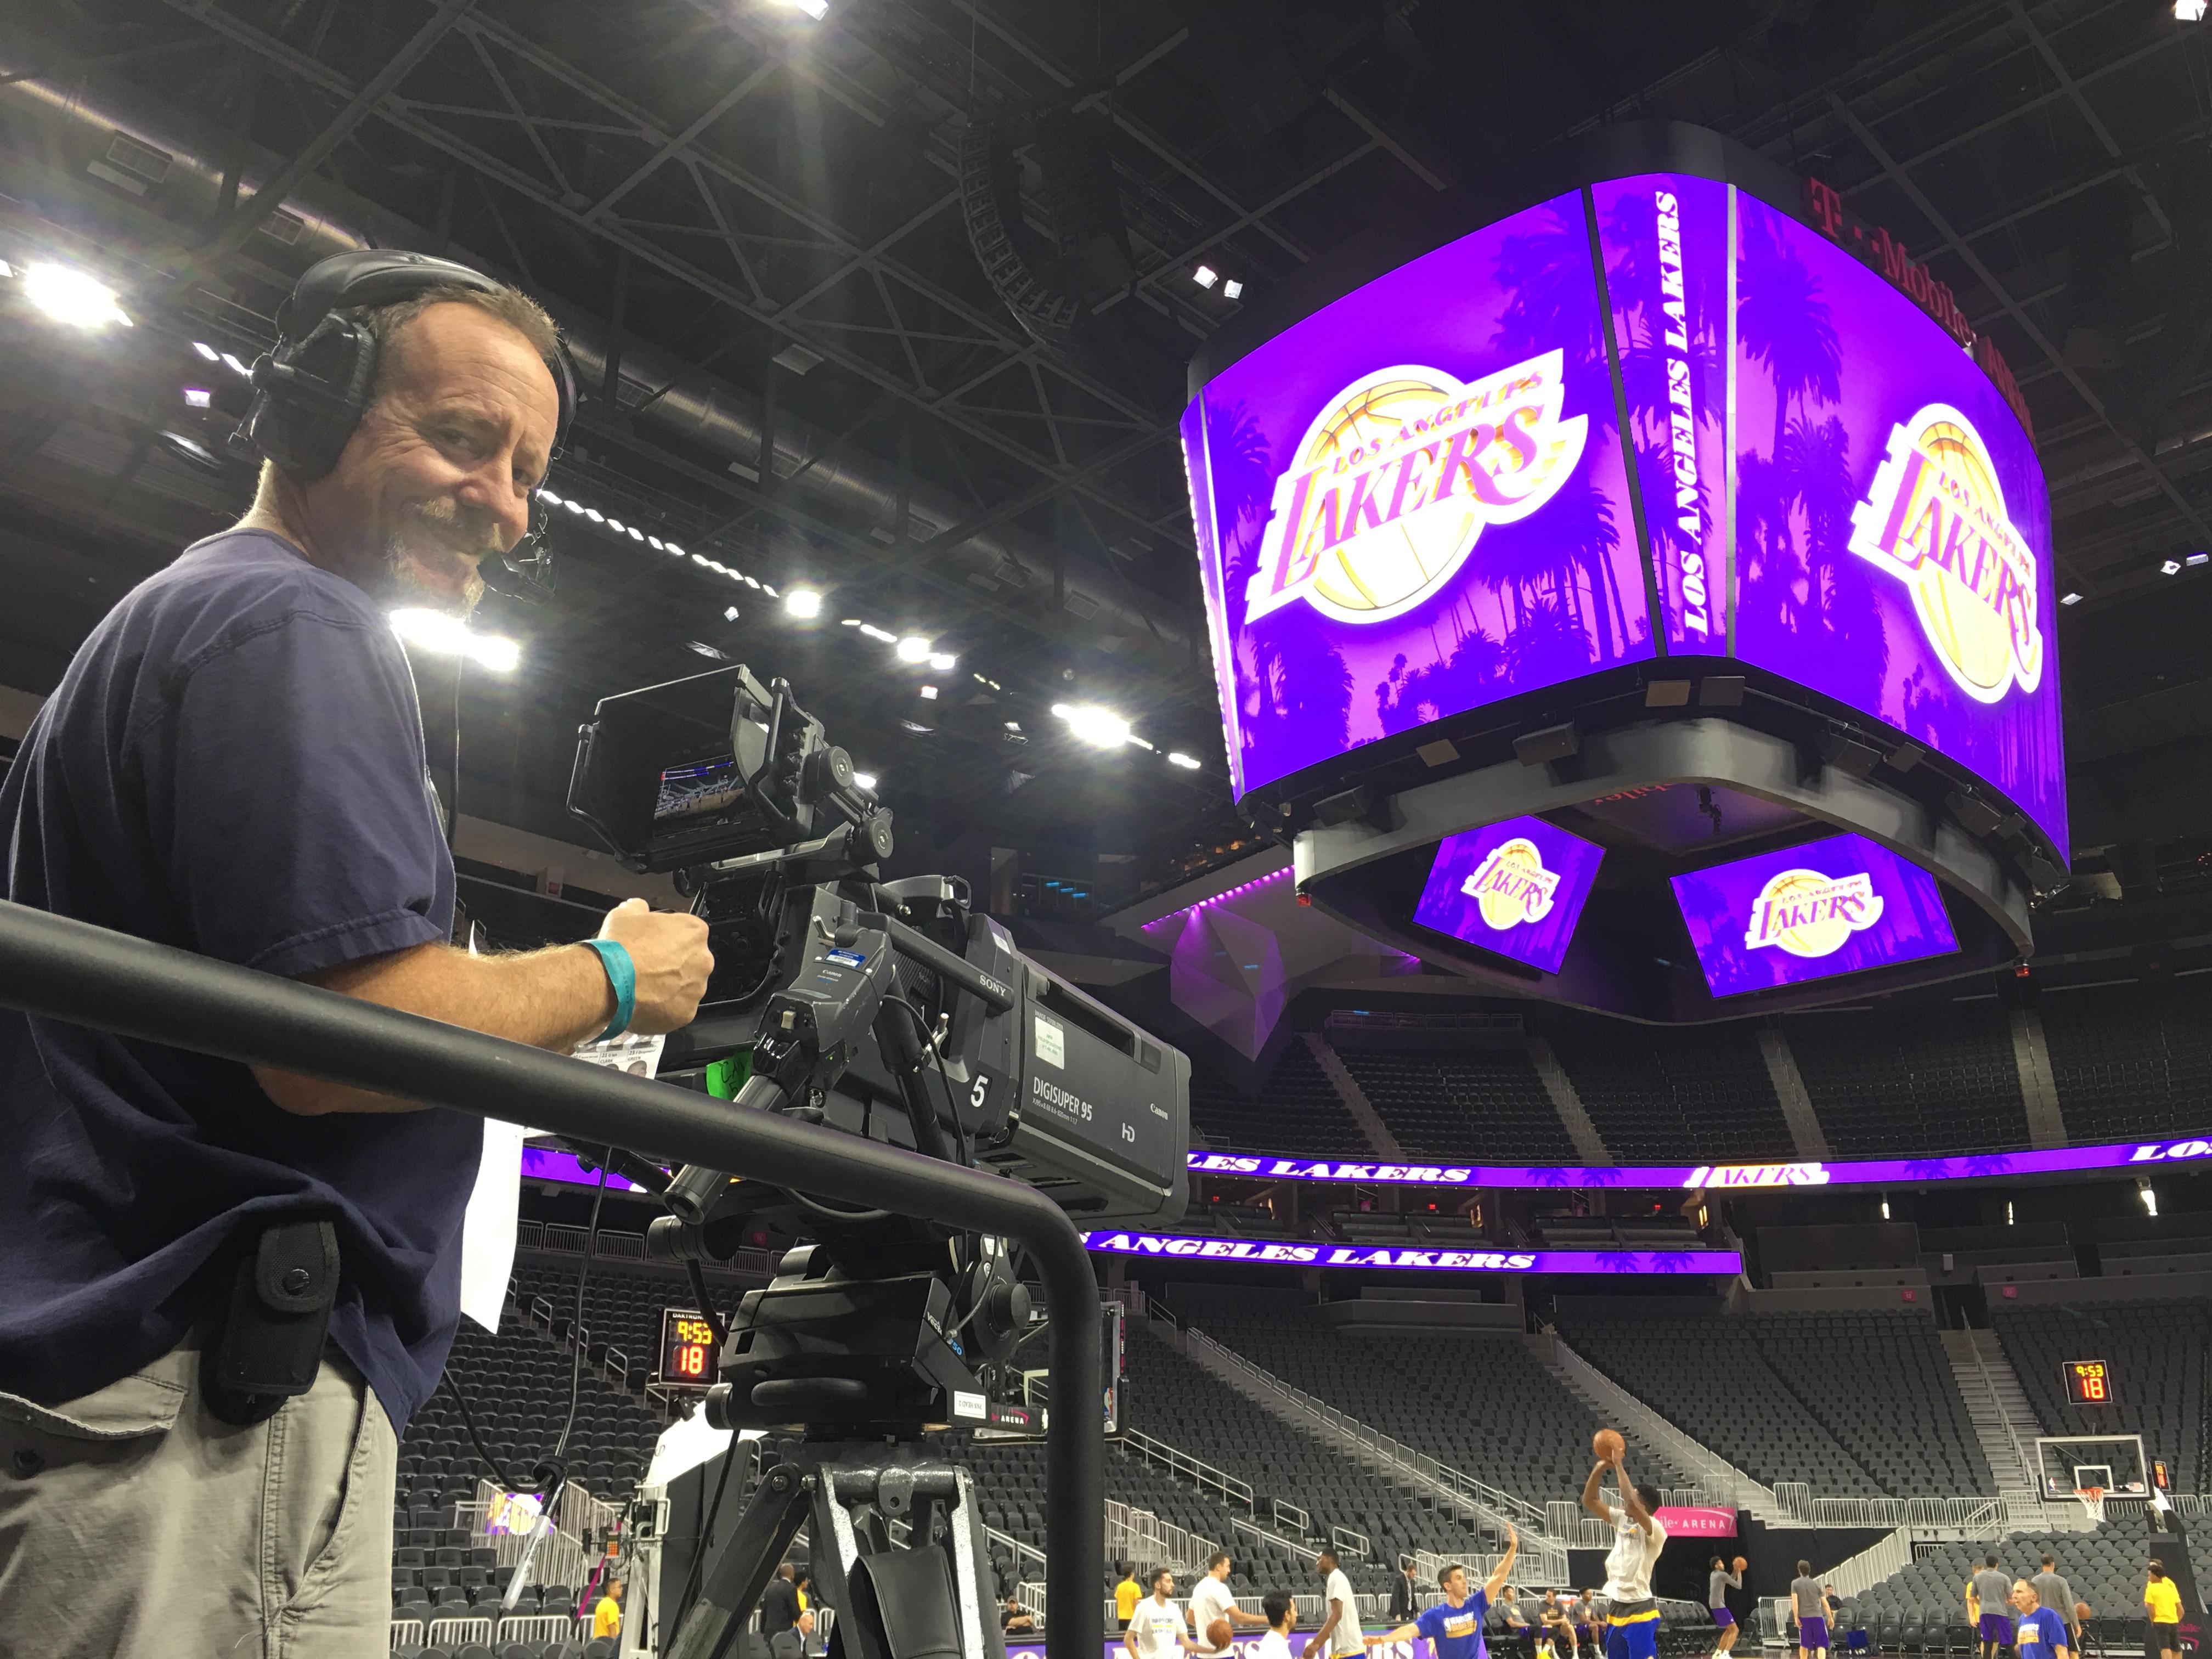 Camera OP Dave McAteer